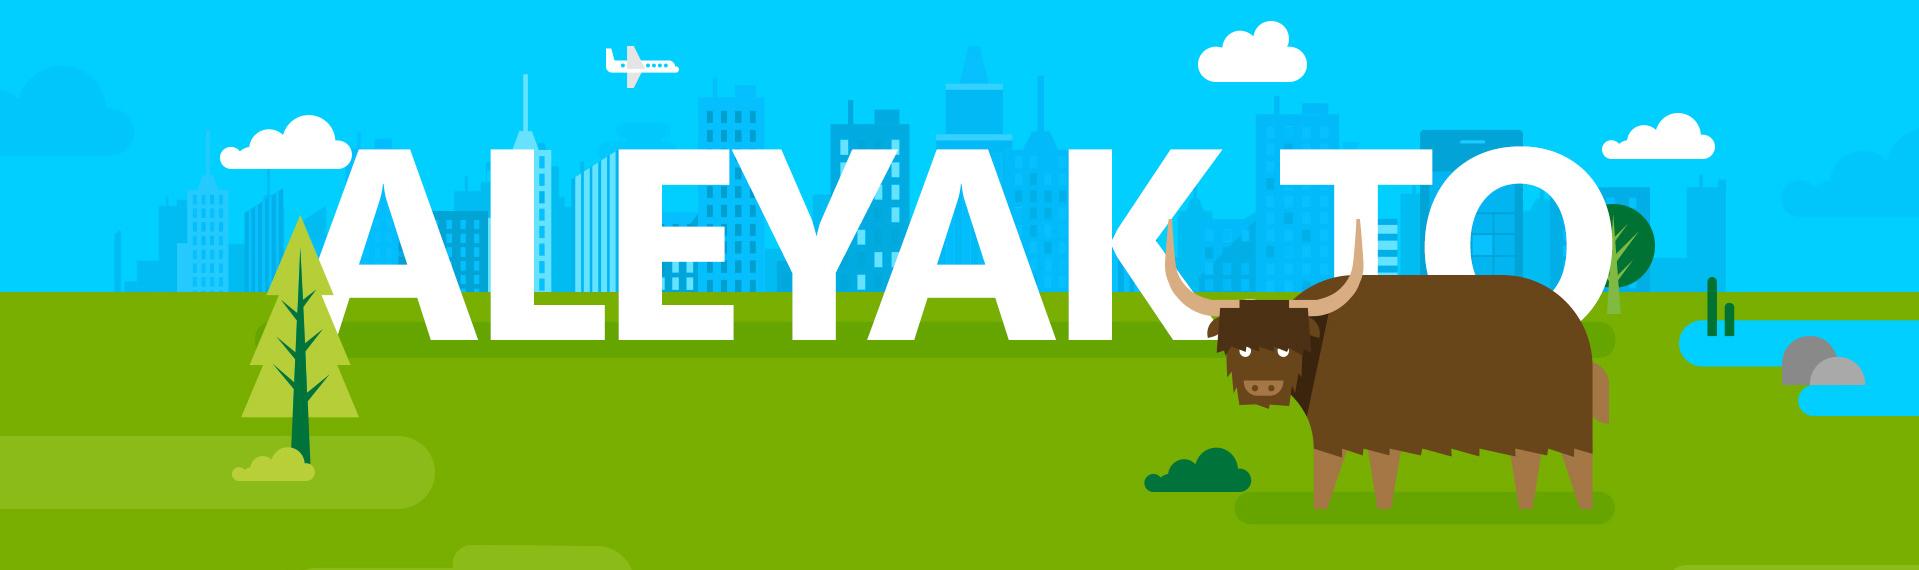 aleyak.to